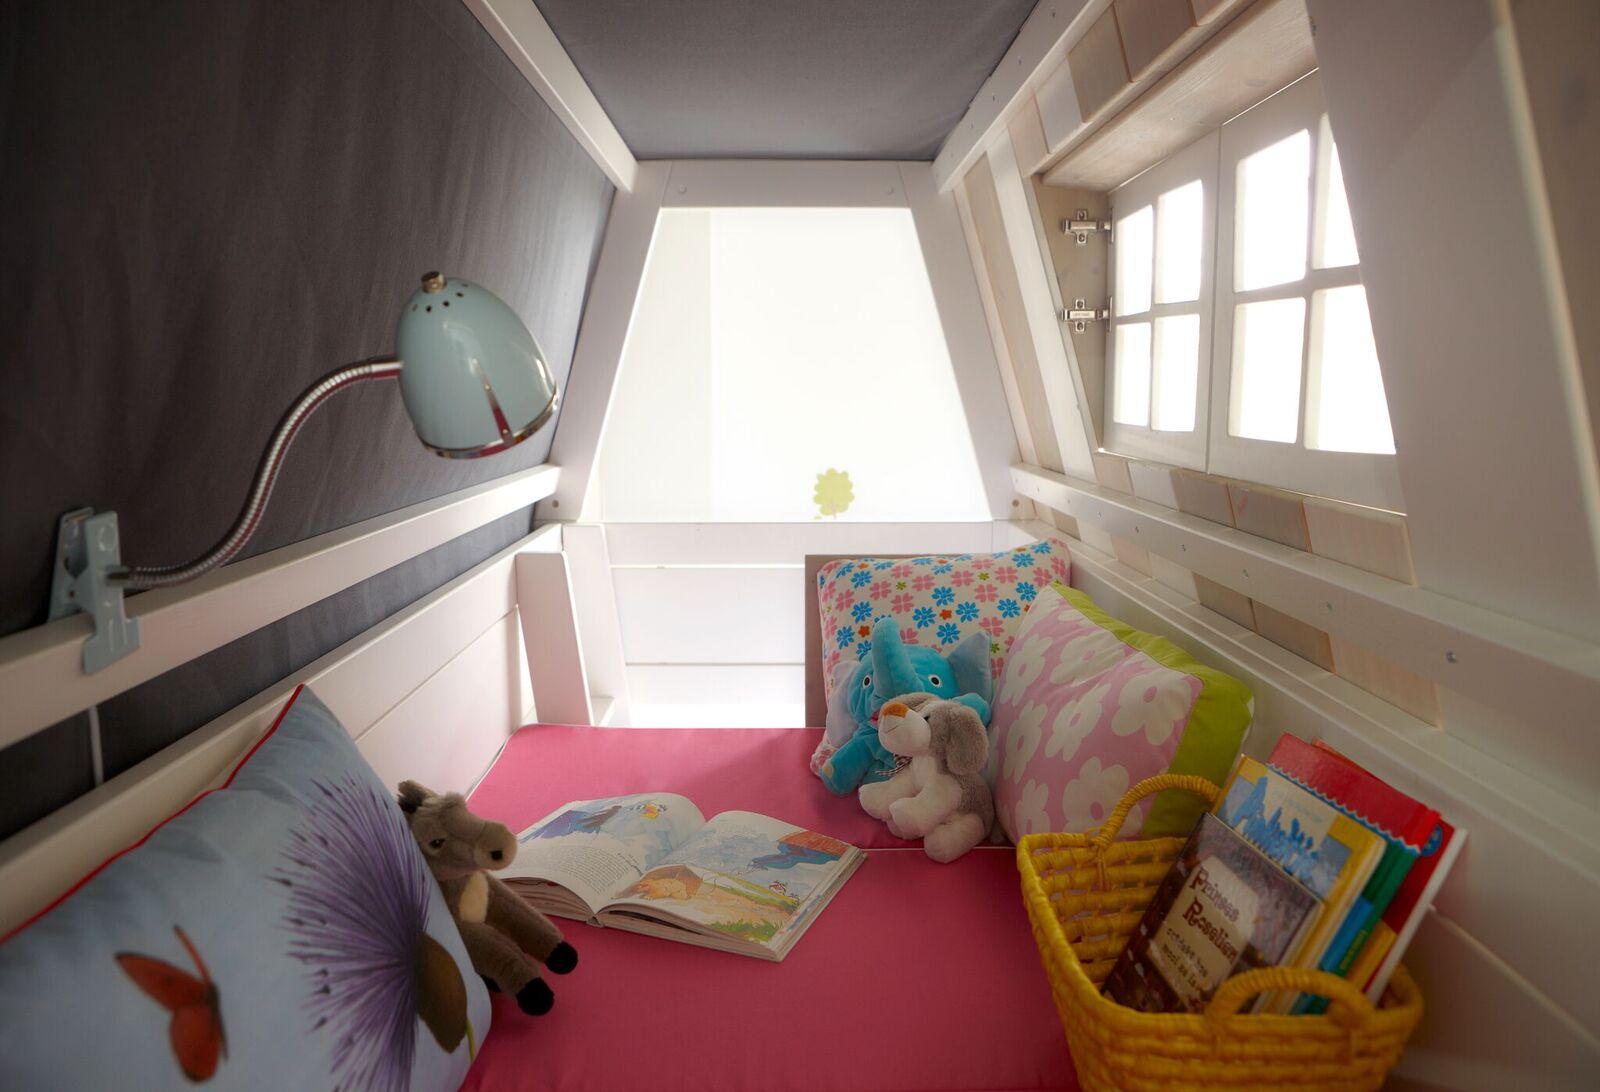 Abenteuerbett Hangout 2 90*200 cm whitewash LIFETIME inklusive Rollrost